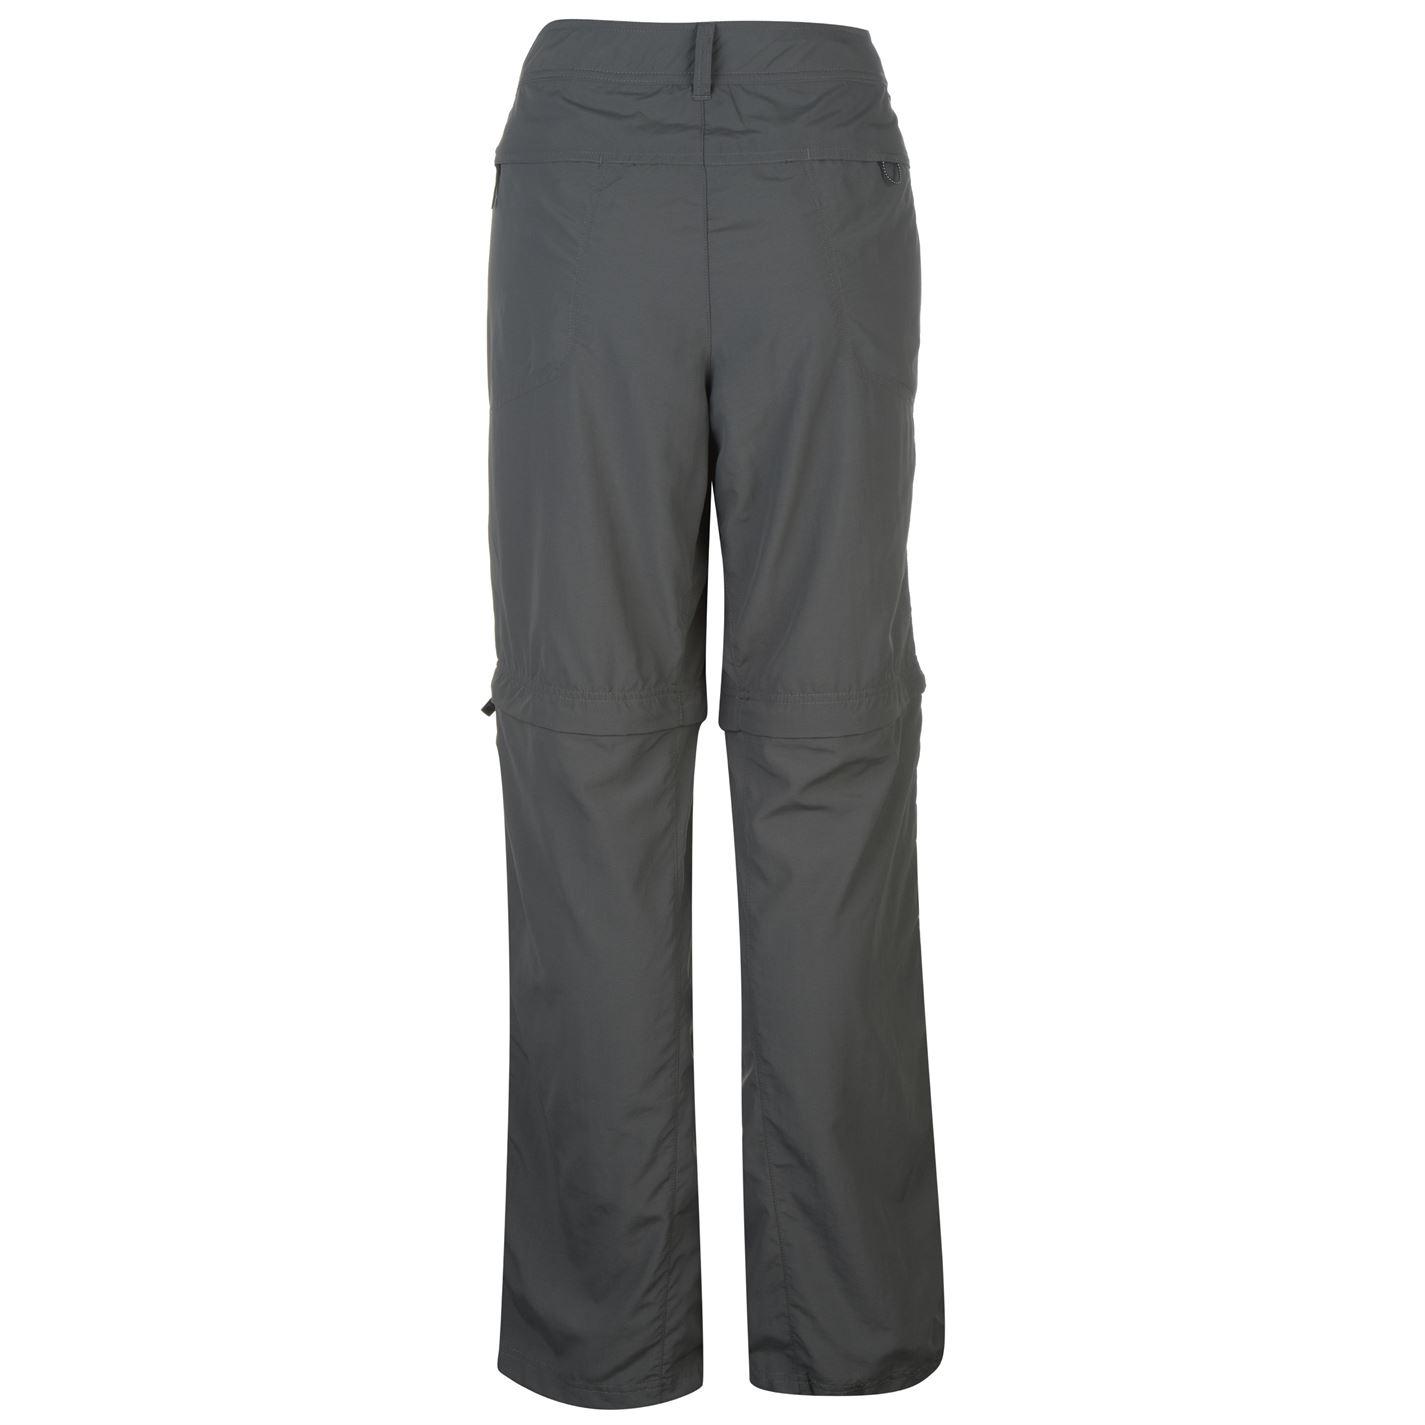 f49fb99b045a2 Columbia Womens Silver Ridge Zip Convertible Pants Walking Trousers ...